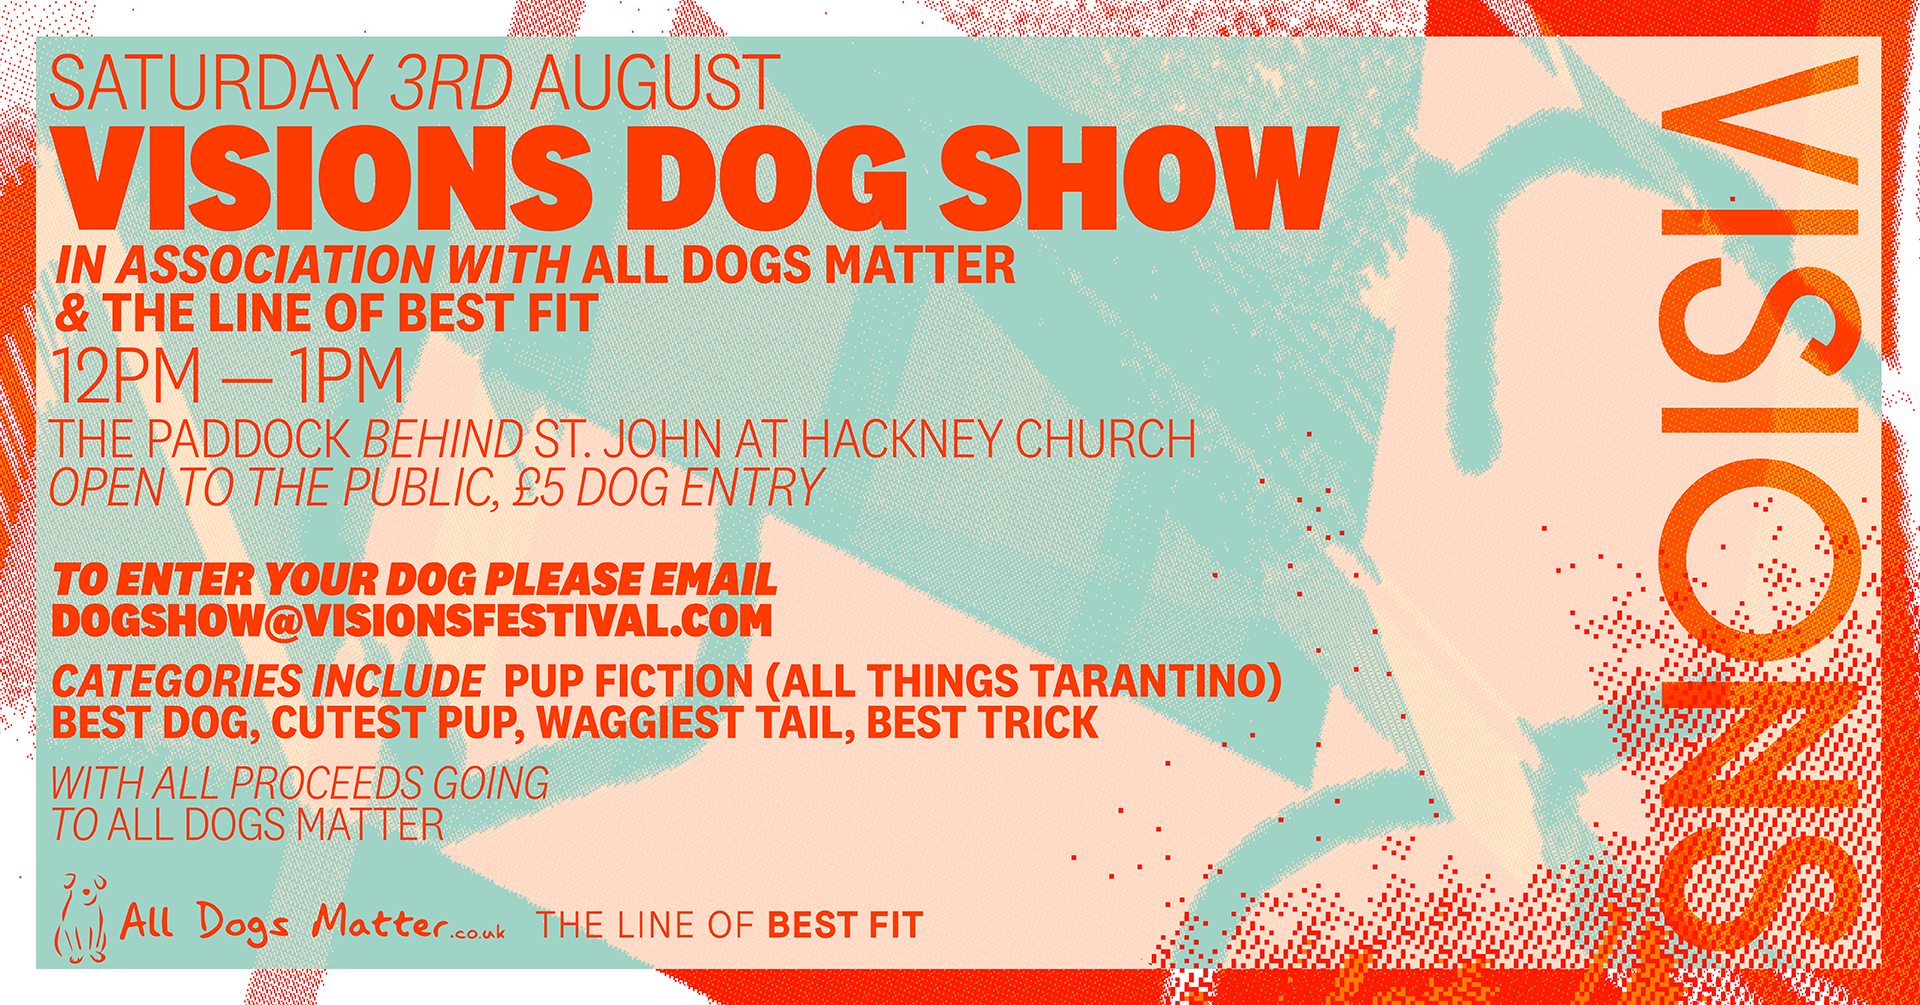 Visions_dog show_3AUG2019.jpg